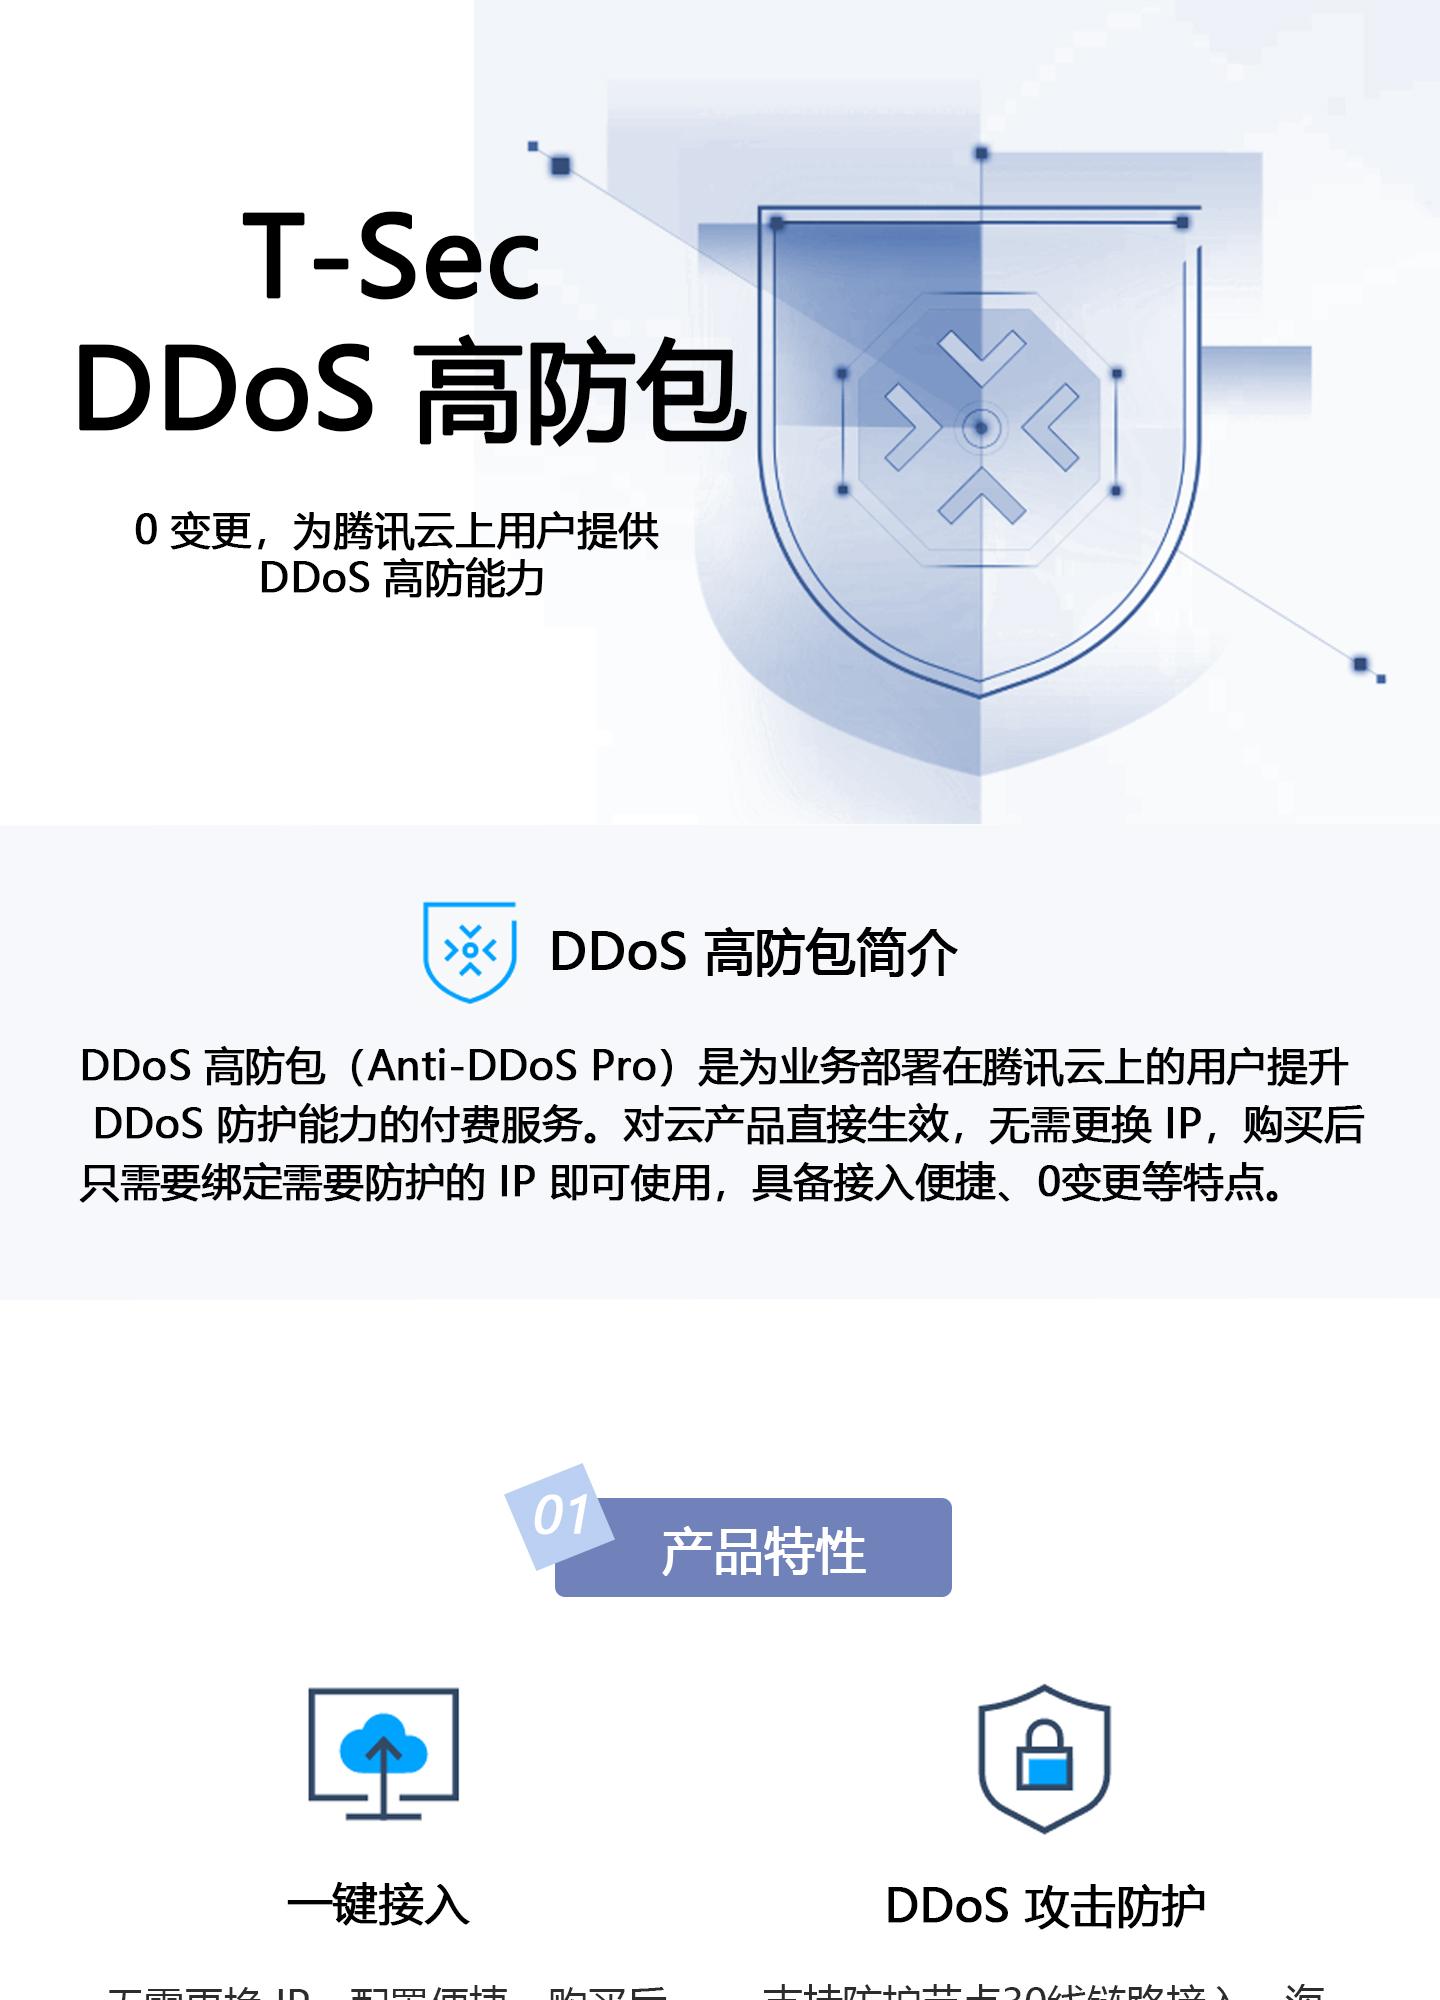 T-Sec-DDoS-高防包1440_01.jpg